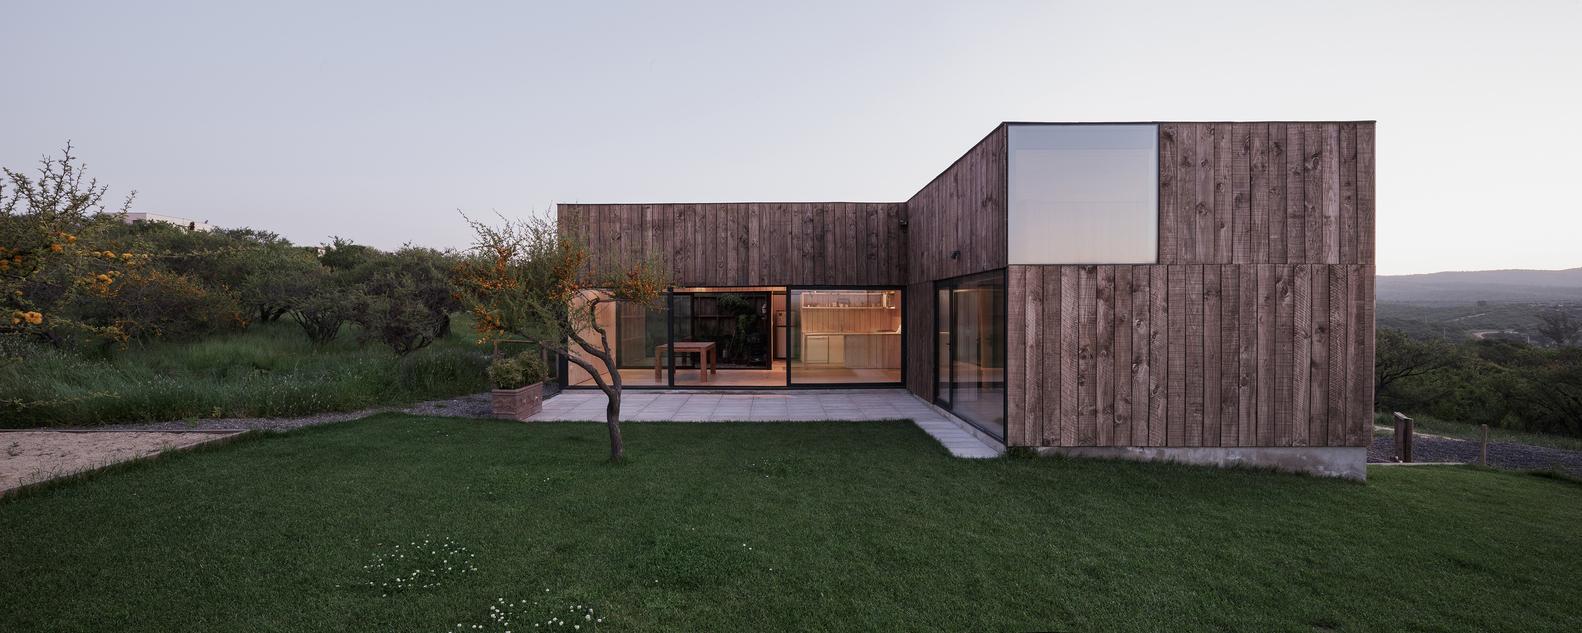 CML House / Ricardo Torrejon & Arturo Chadwick (21)